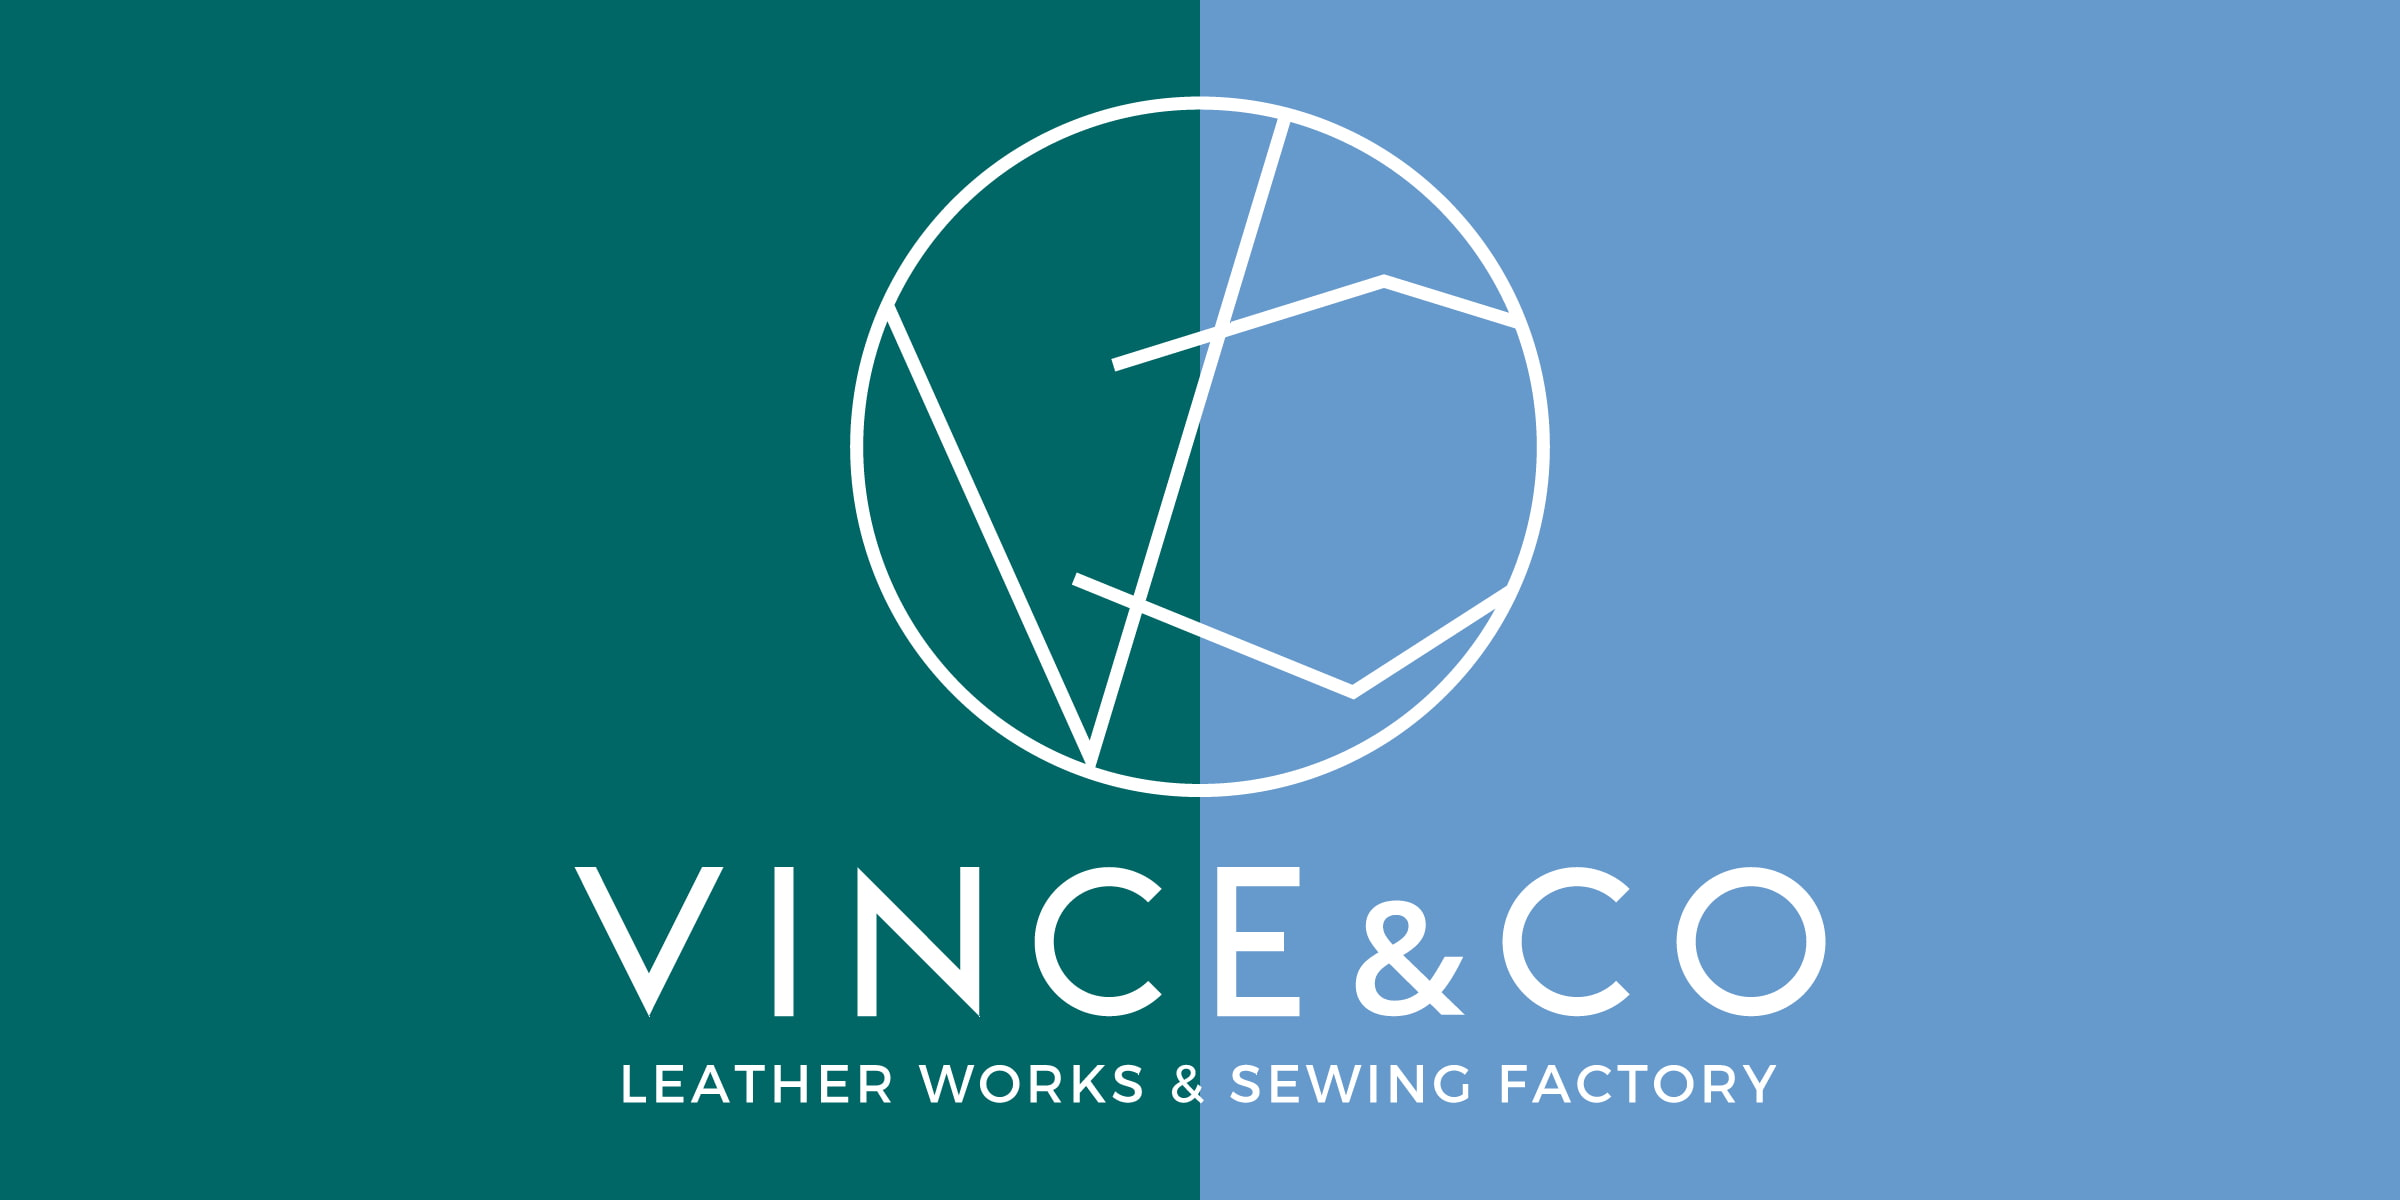 「VINCE&CO」のアイキャッチ画像